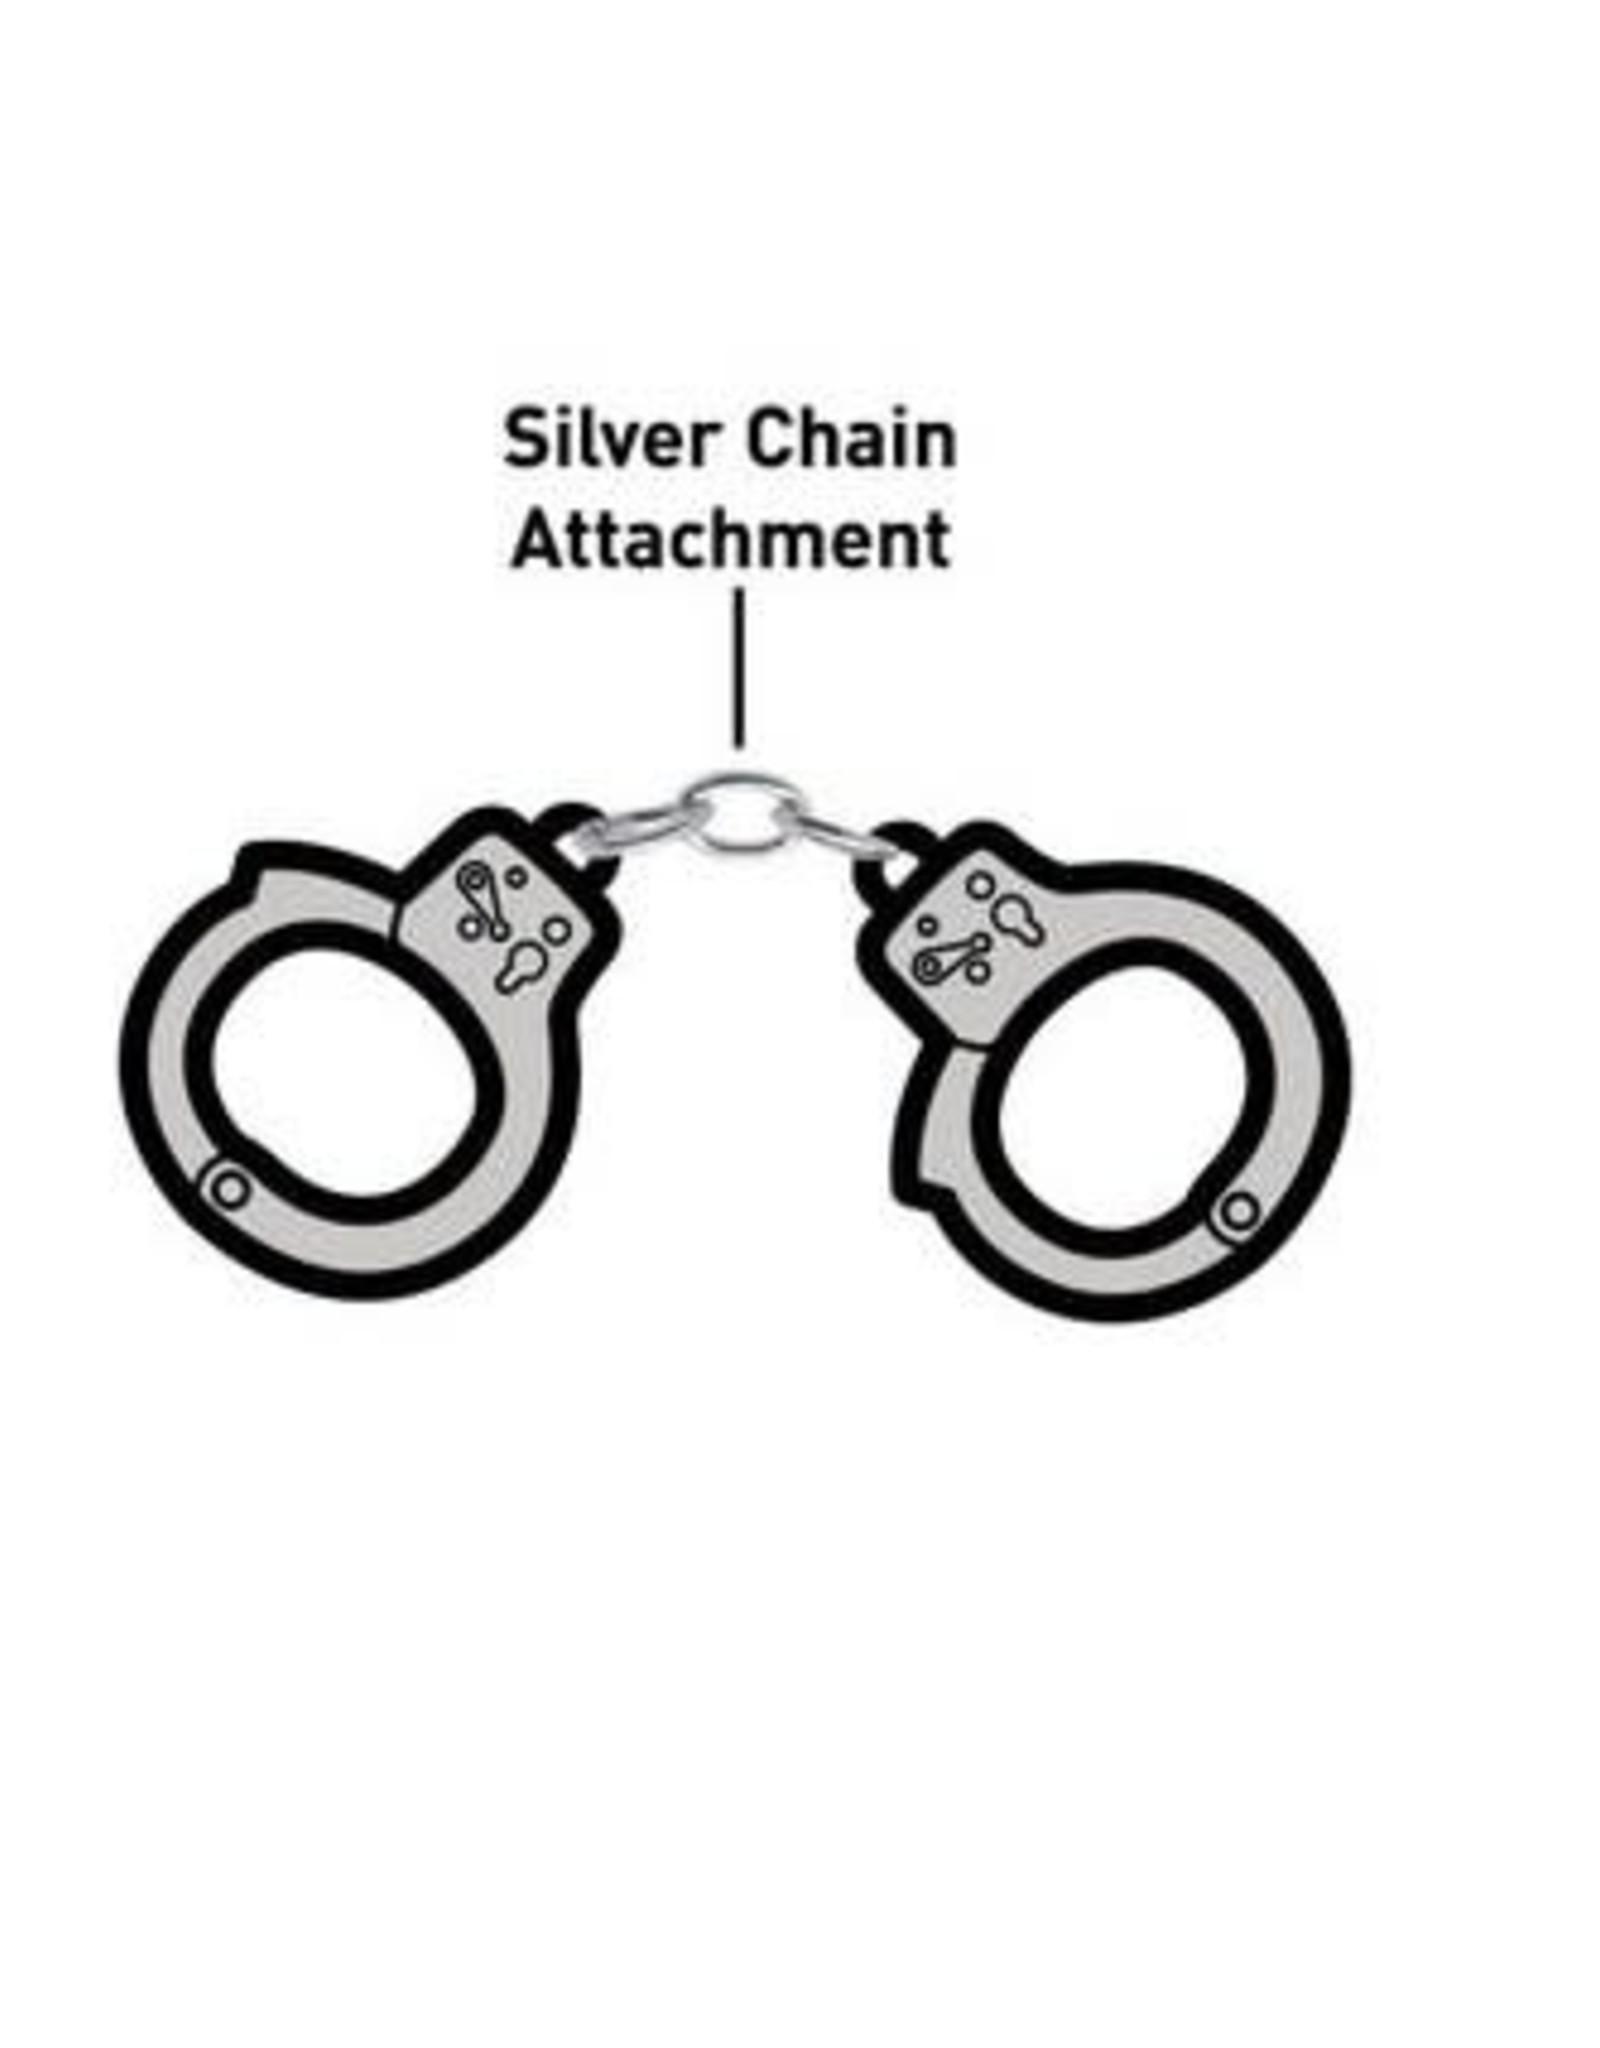 Enamel Pin Handcuffs Linked Enamel Pin